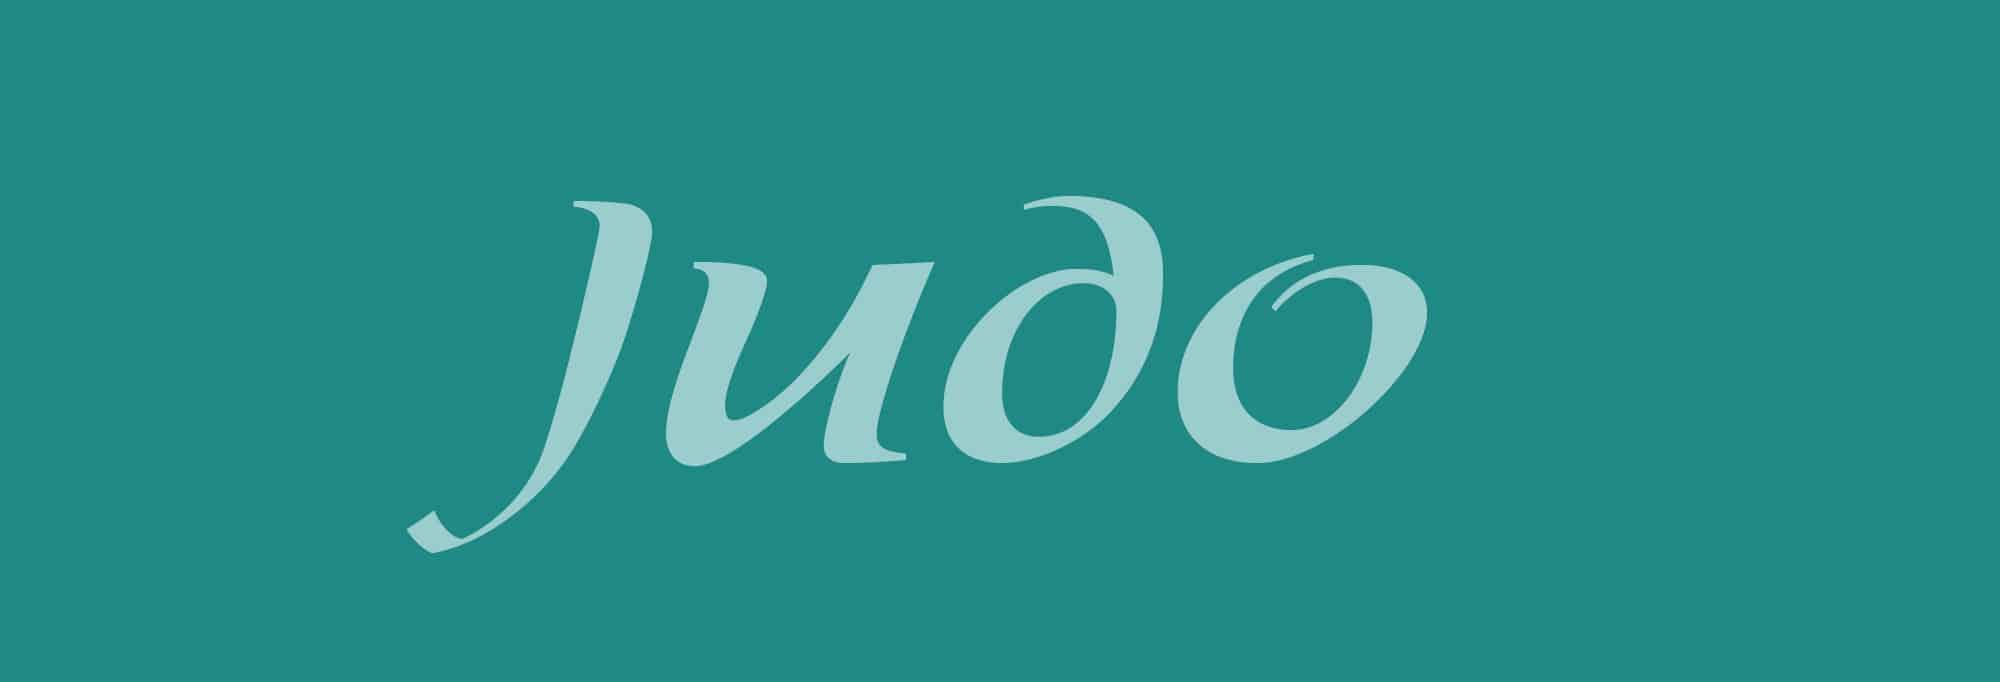 CTV_Judo-ND_bauertypes_01